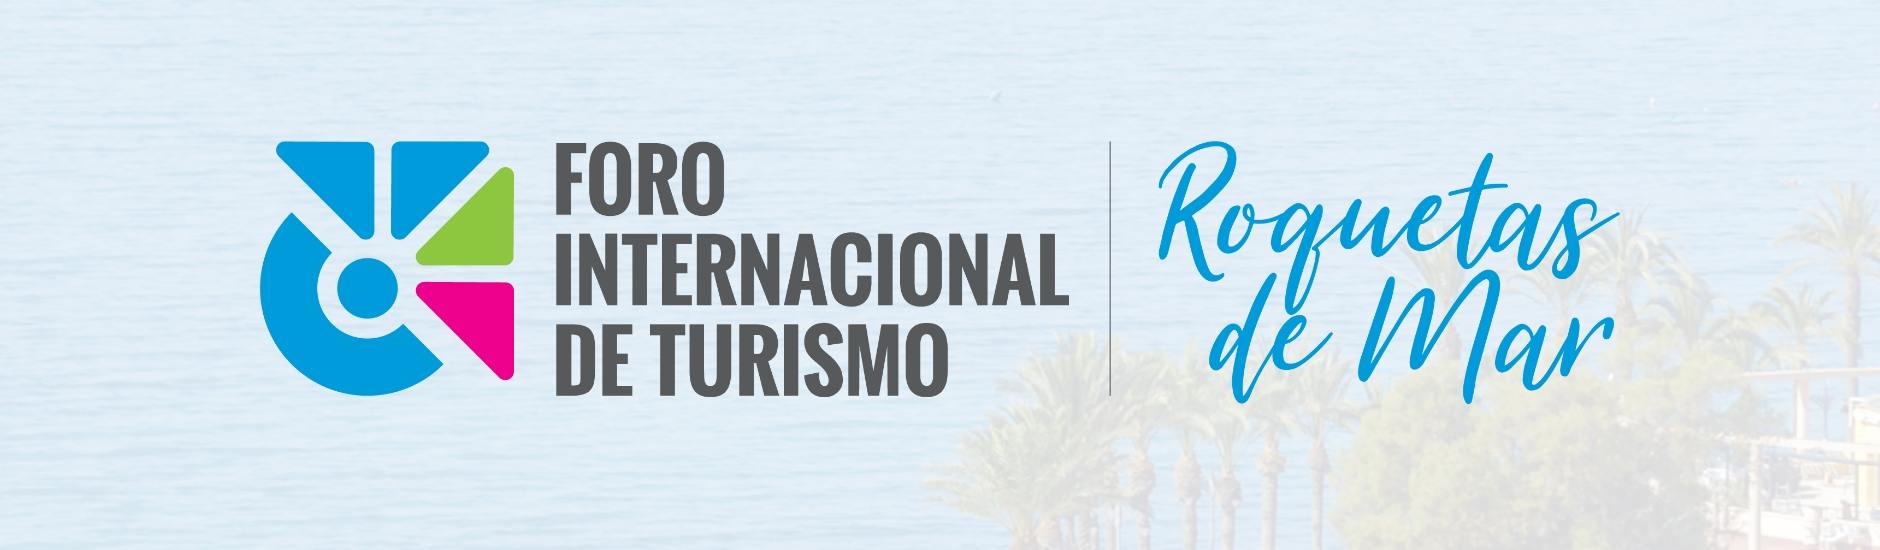 Fitmar - Foro internacional turismo